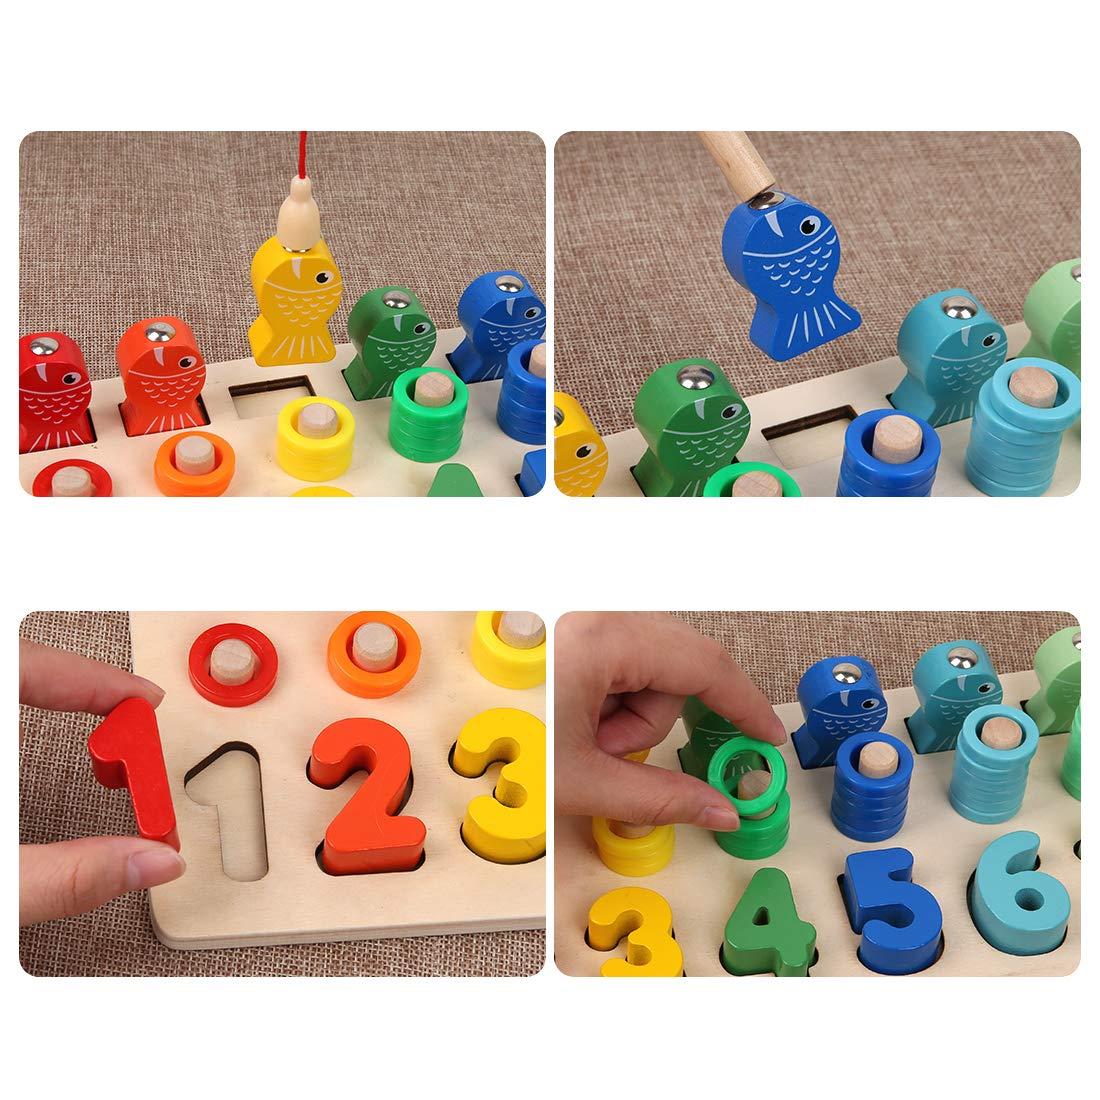 puzzle de bloques montessori desarrollo del juego